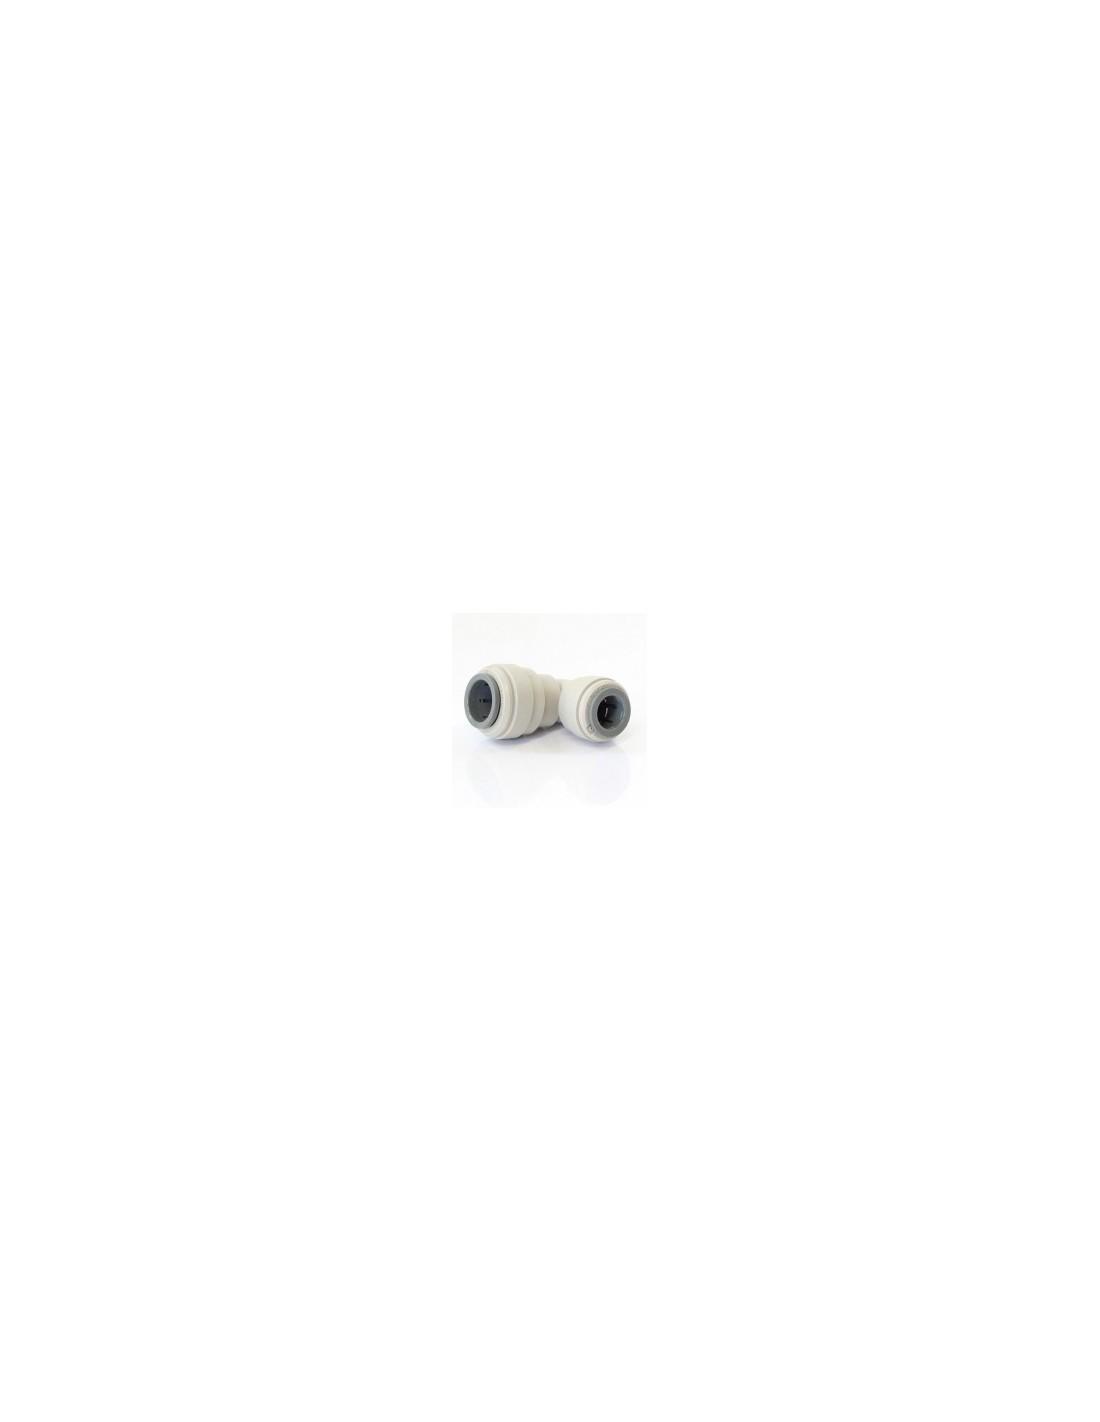 "SPO00282 - JG elbow reducer 12.7 x 9.5 mm (1/2"" x 3/8"") (pi211612s)"